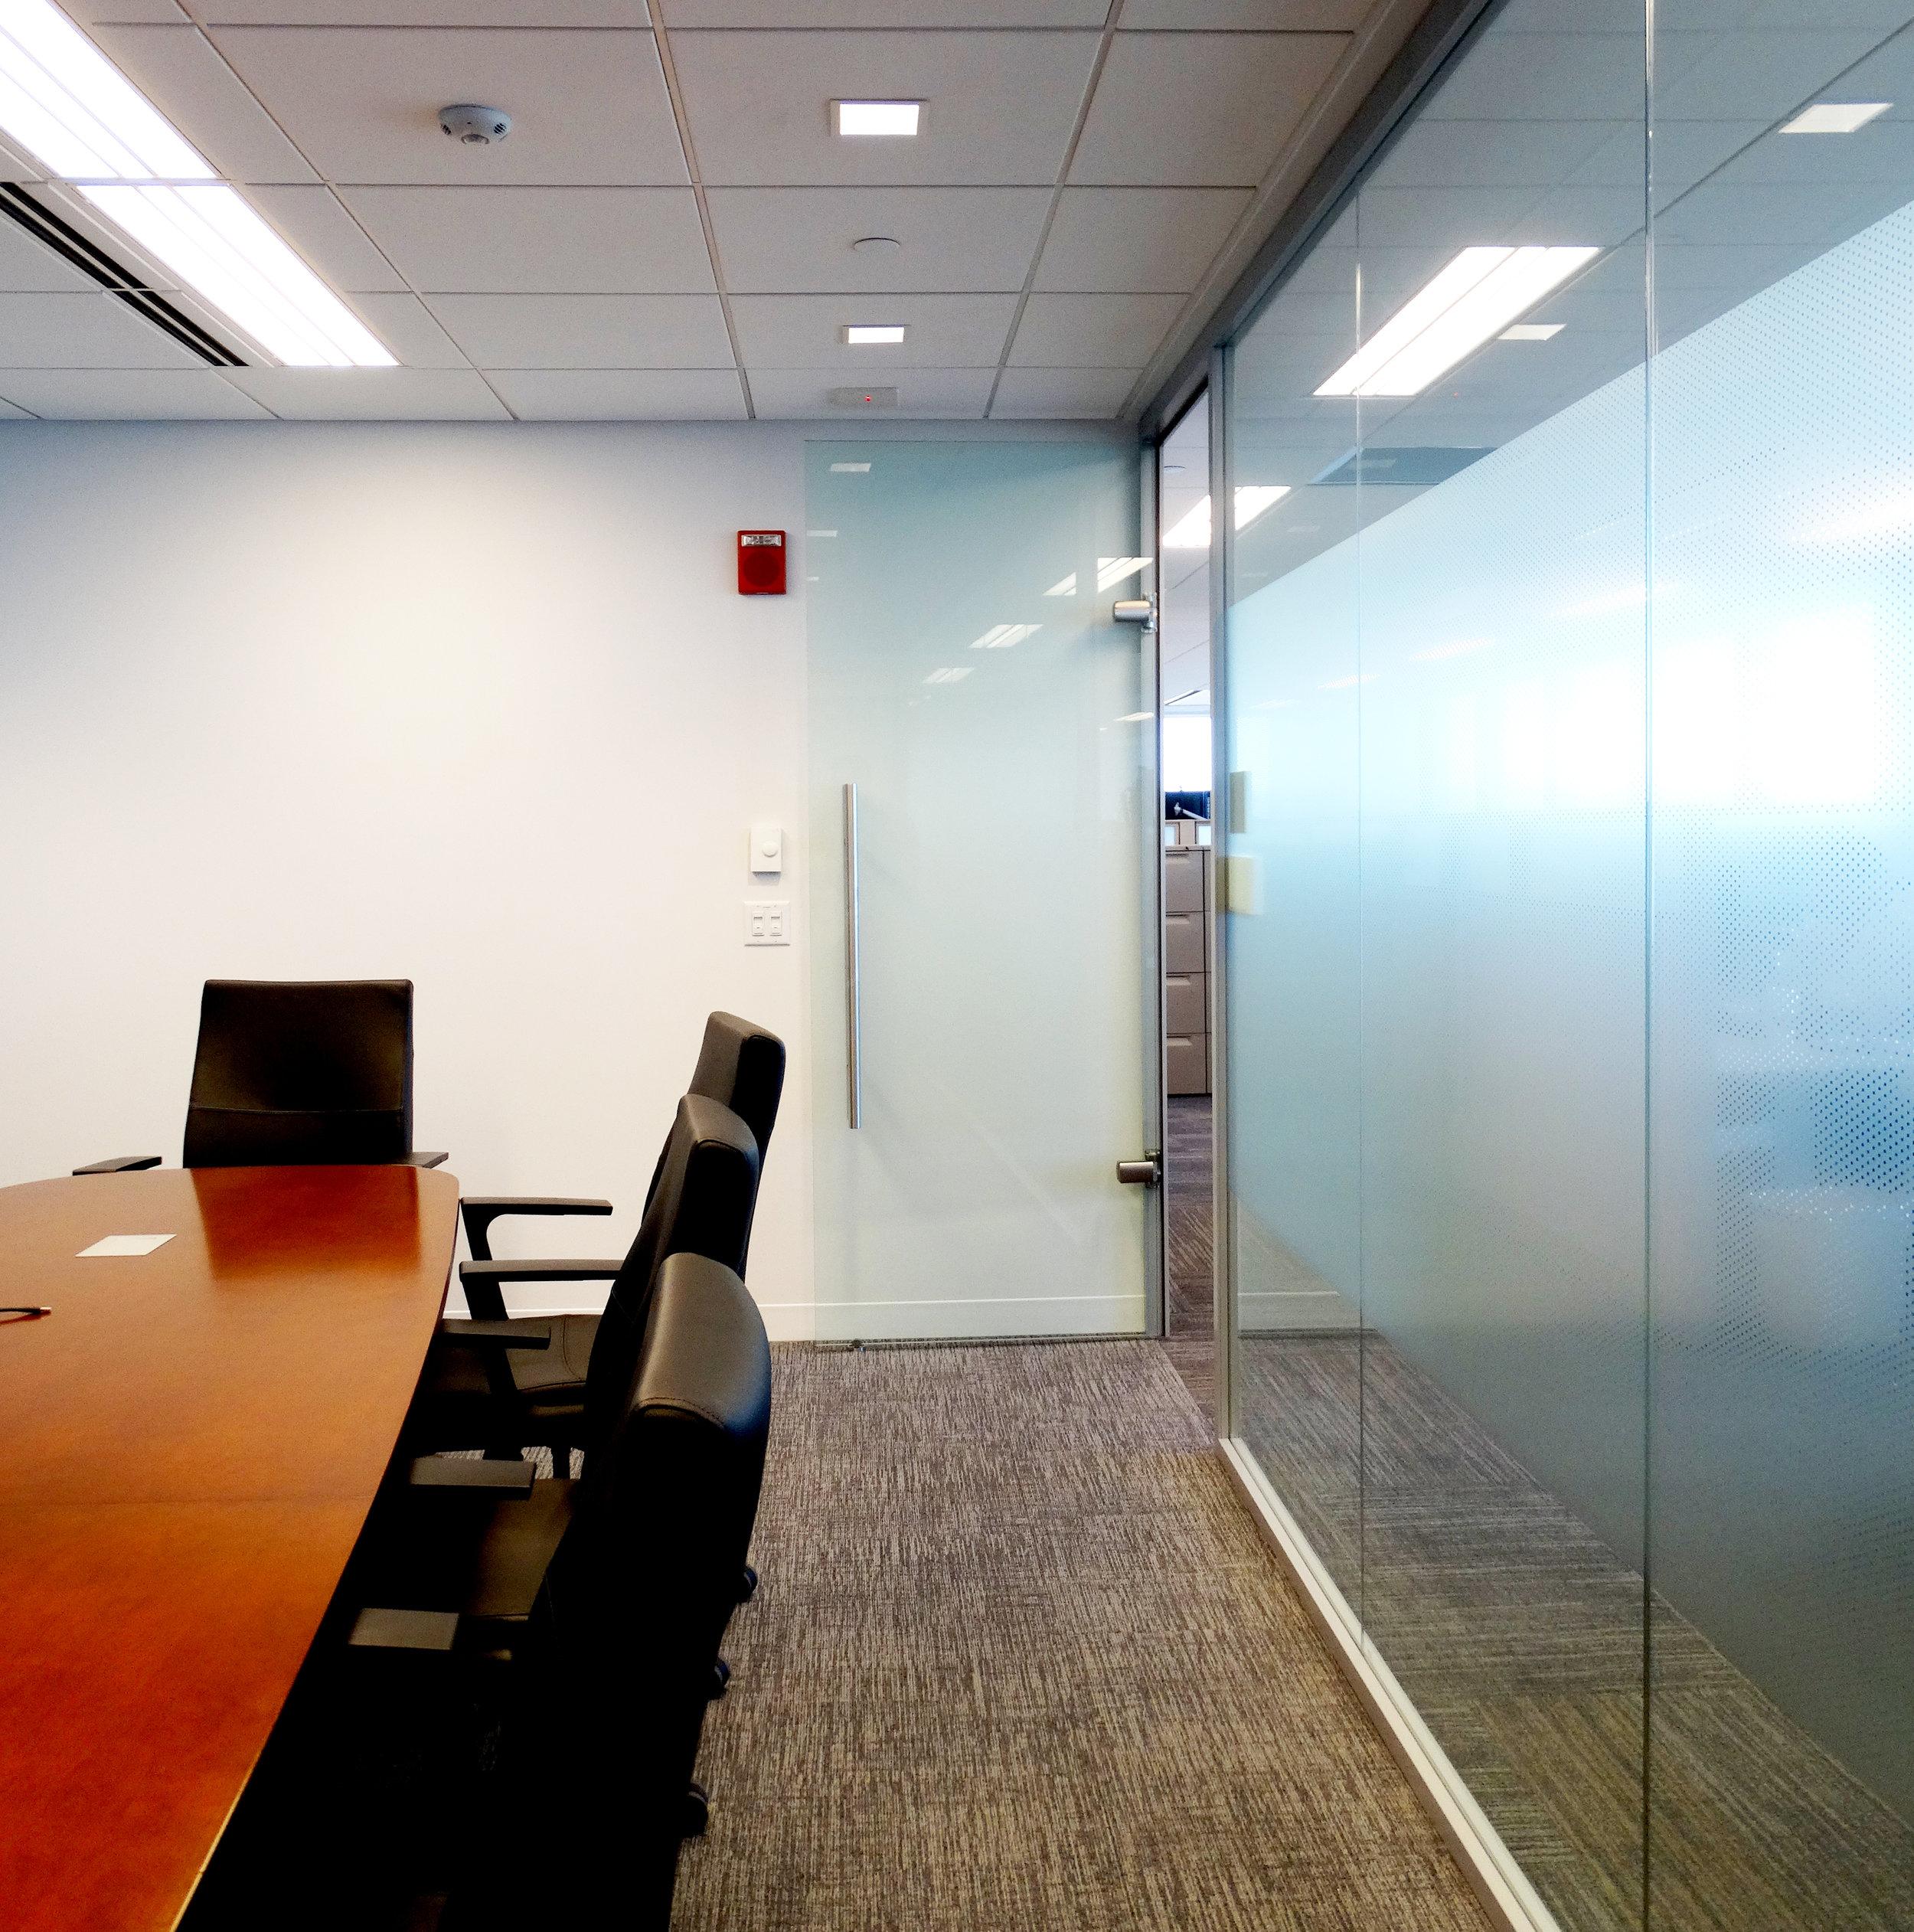 Litespace Demountable Glass Conference Room Wall - Spaceworks AI.jpg